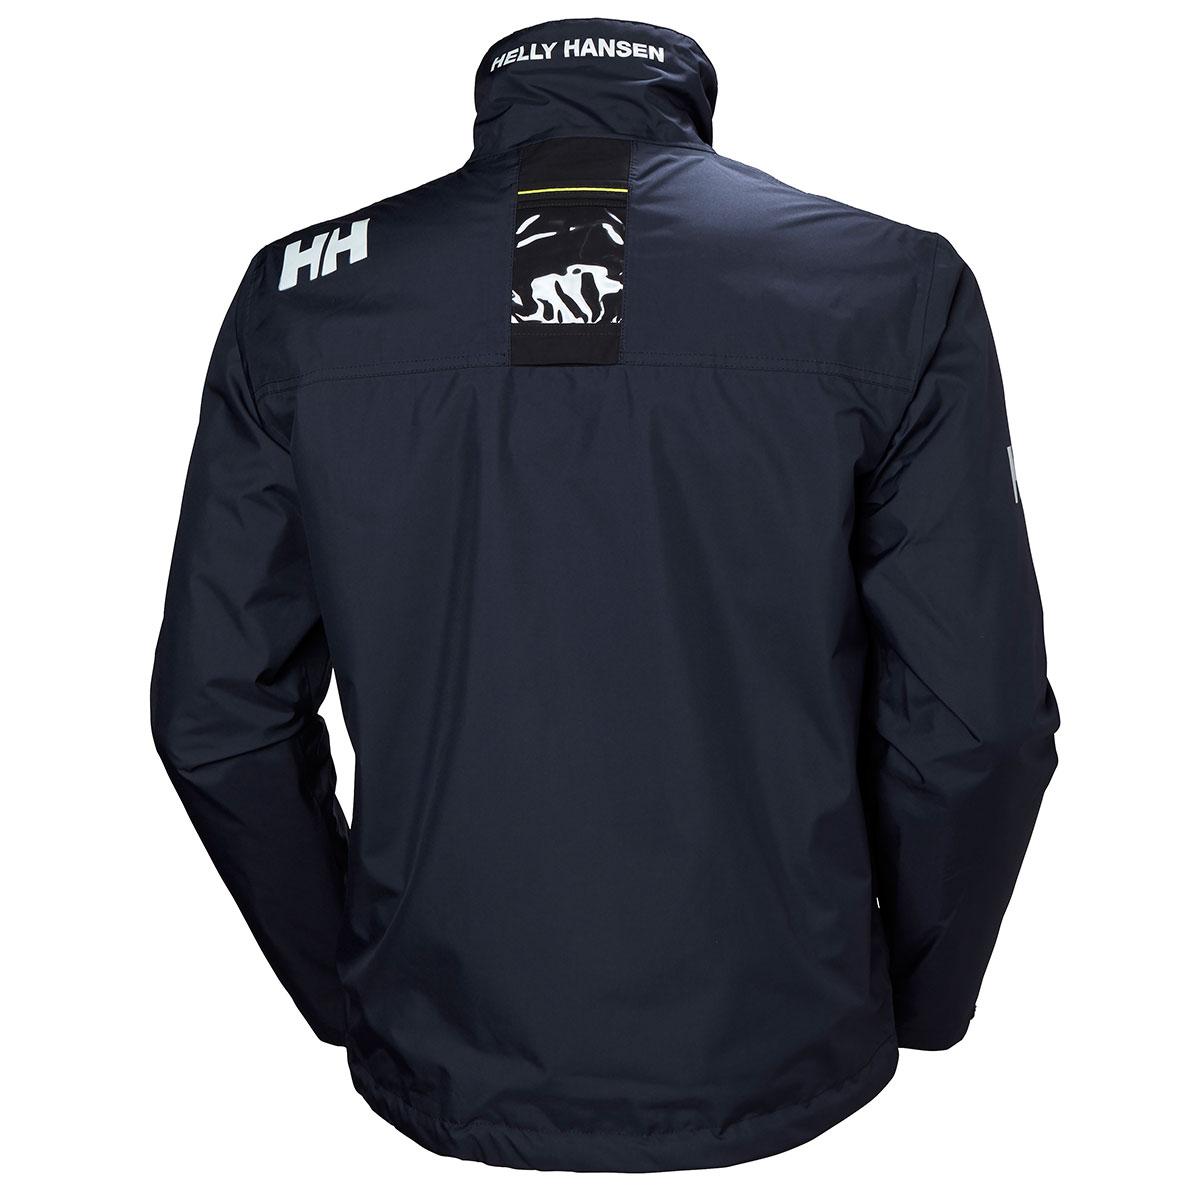 Helly-Hansen-Mens-2019-Crew-Midlayer-Waterproof-Windproof-Adjustable-Jacket thumbnail 6